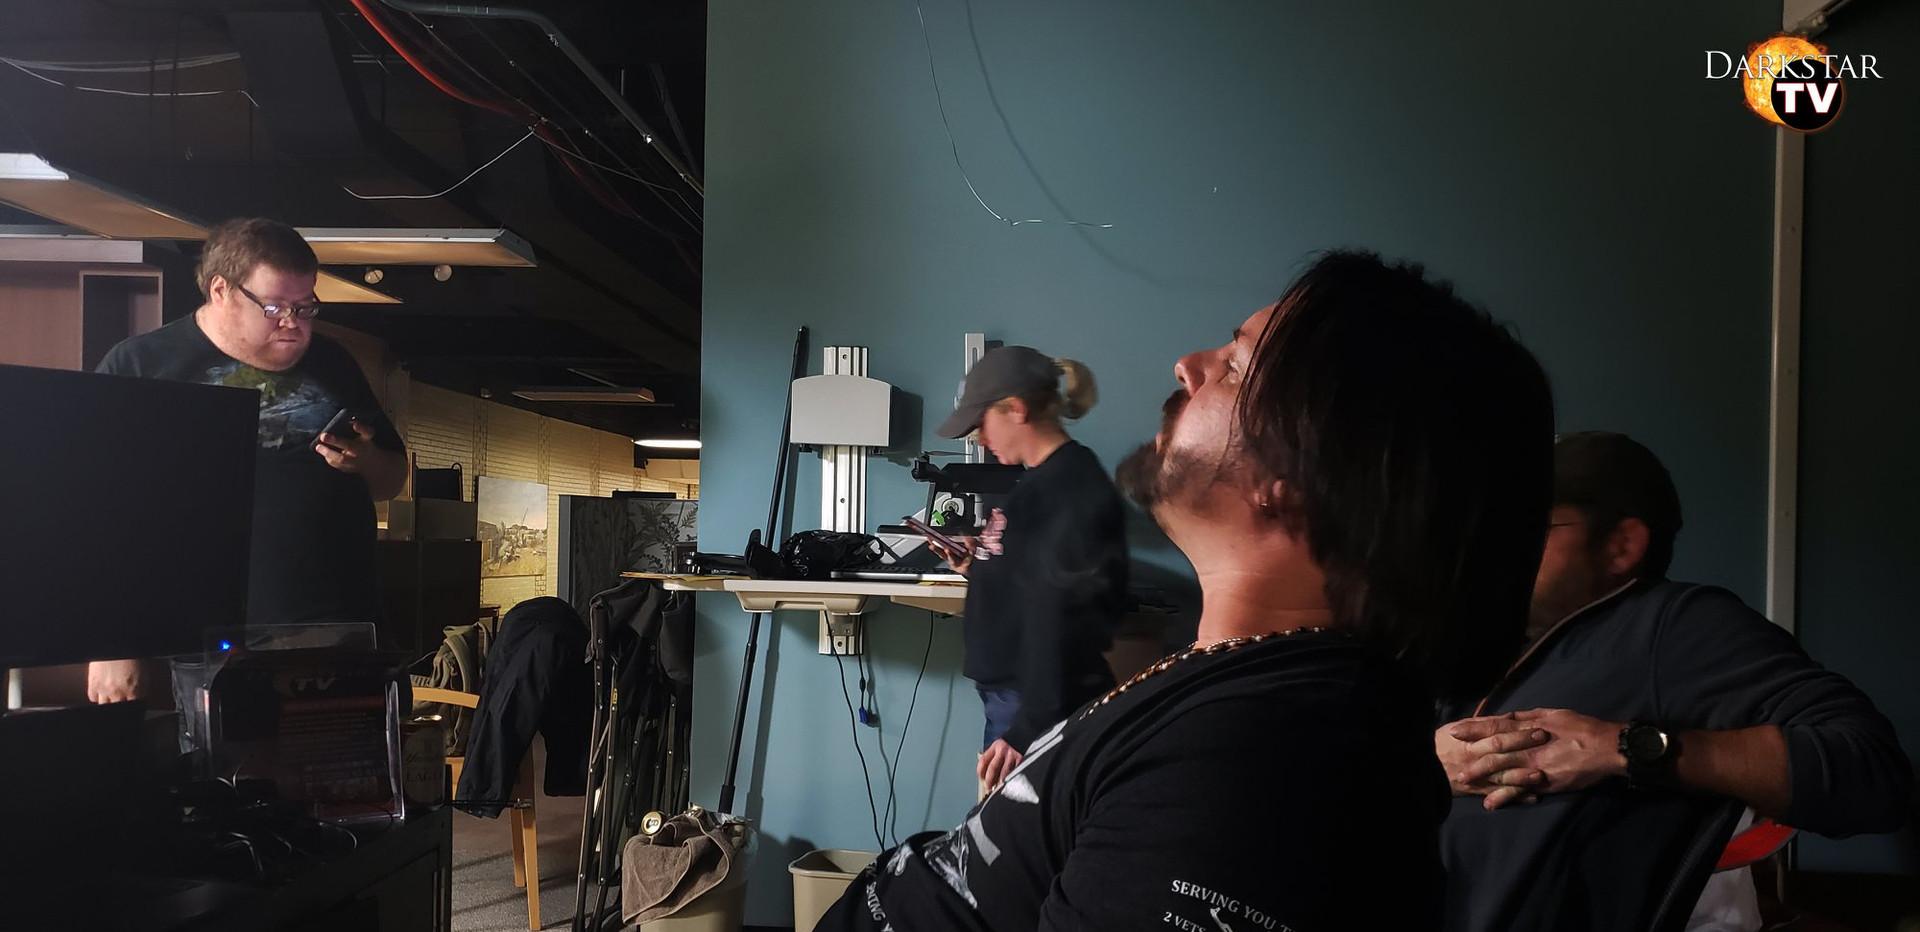 Sean looks on during VilleTV break